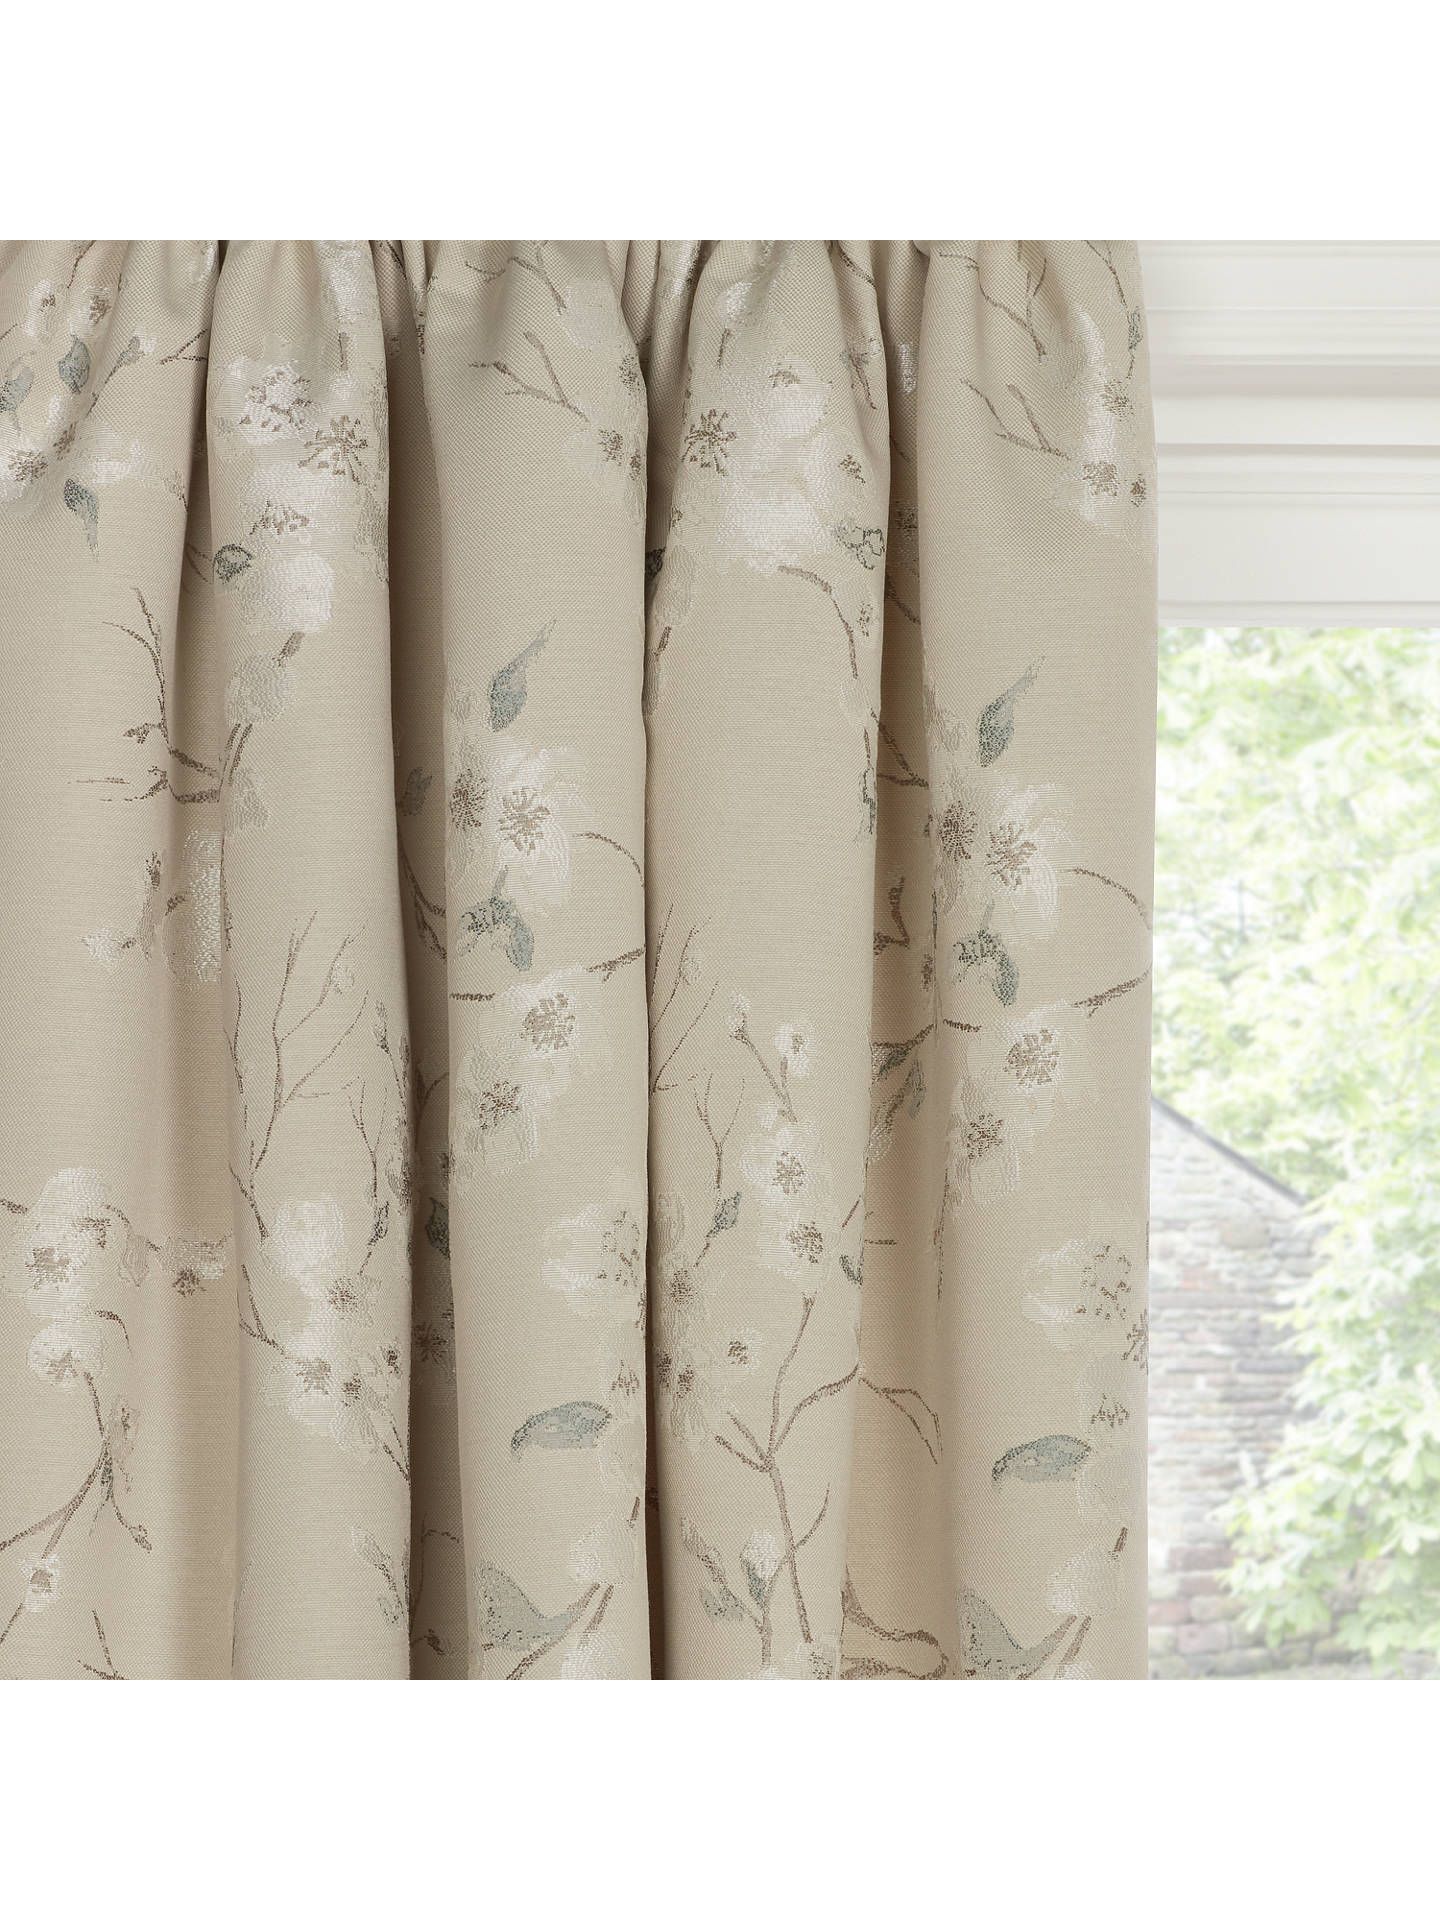 john lewis partners misaki weave pair lined pencil pleat. Black Bedroom Furniture Sets. Home Design Ideas